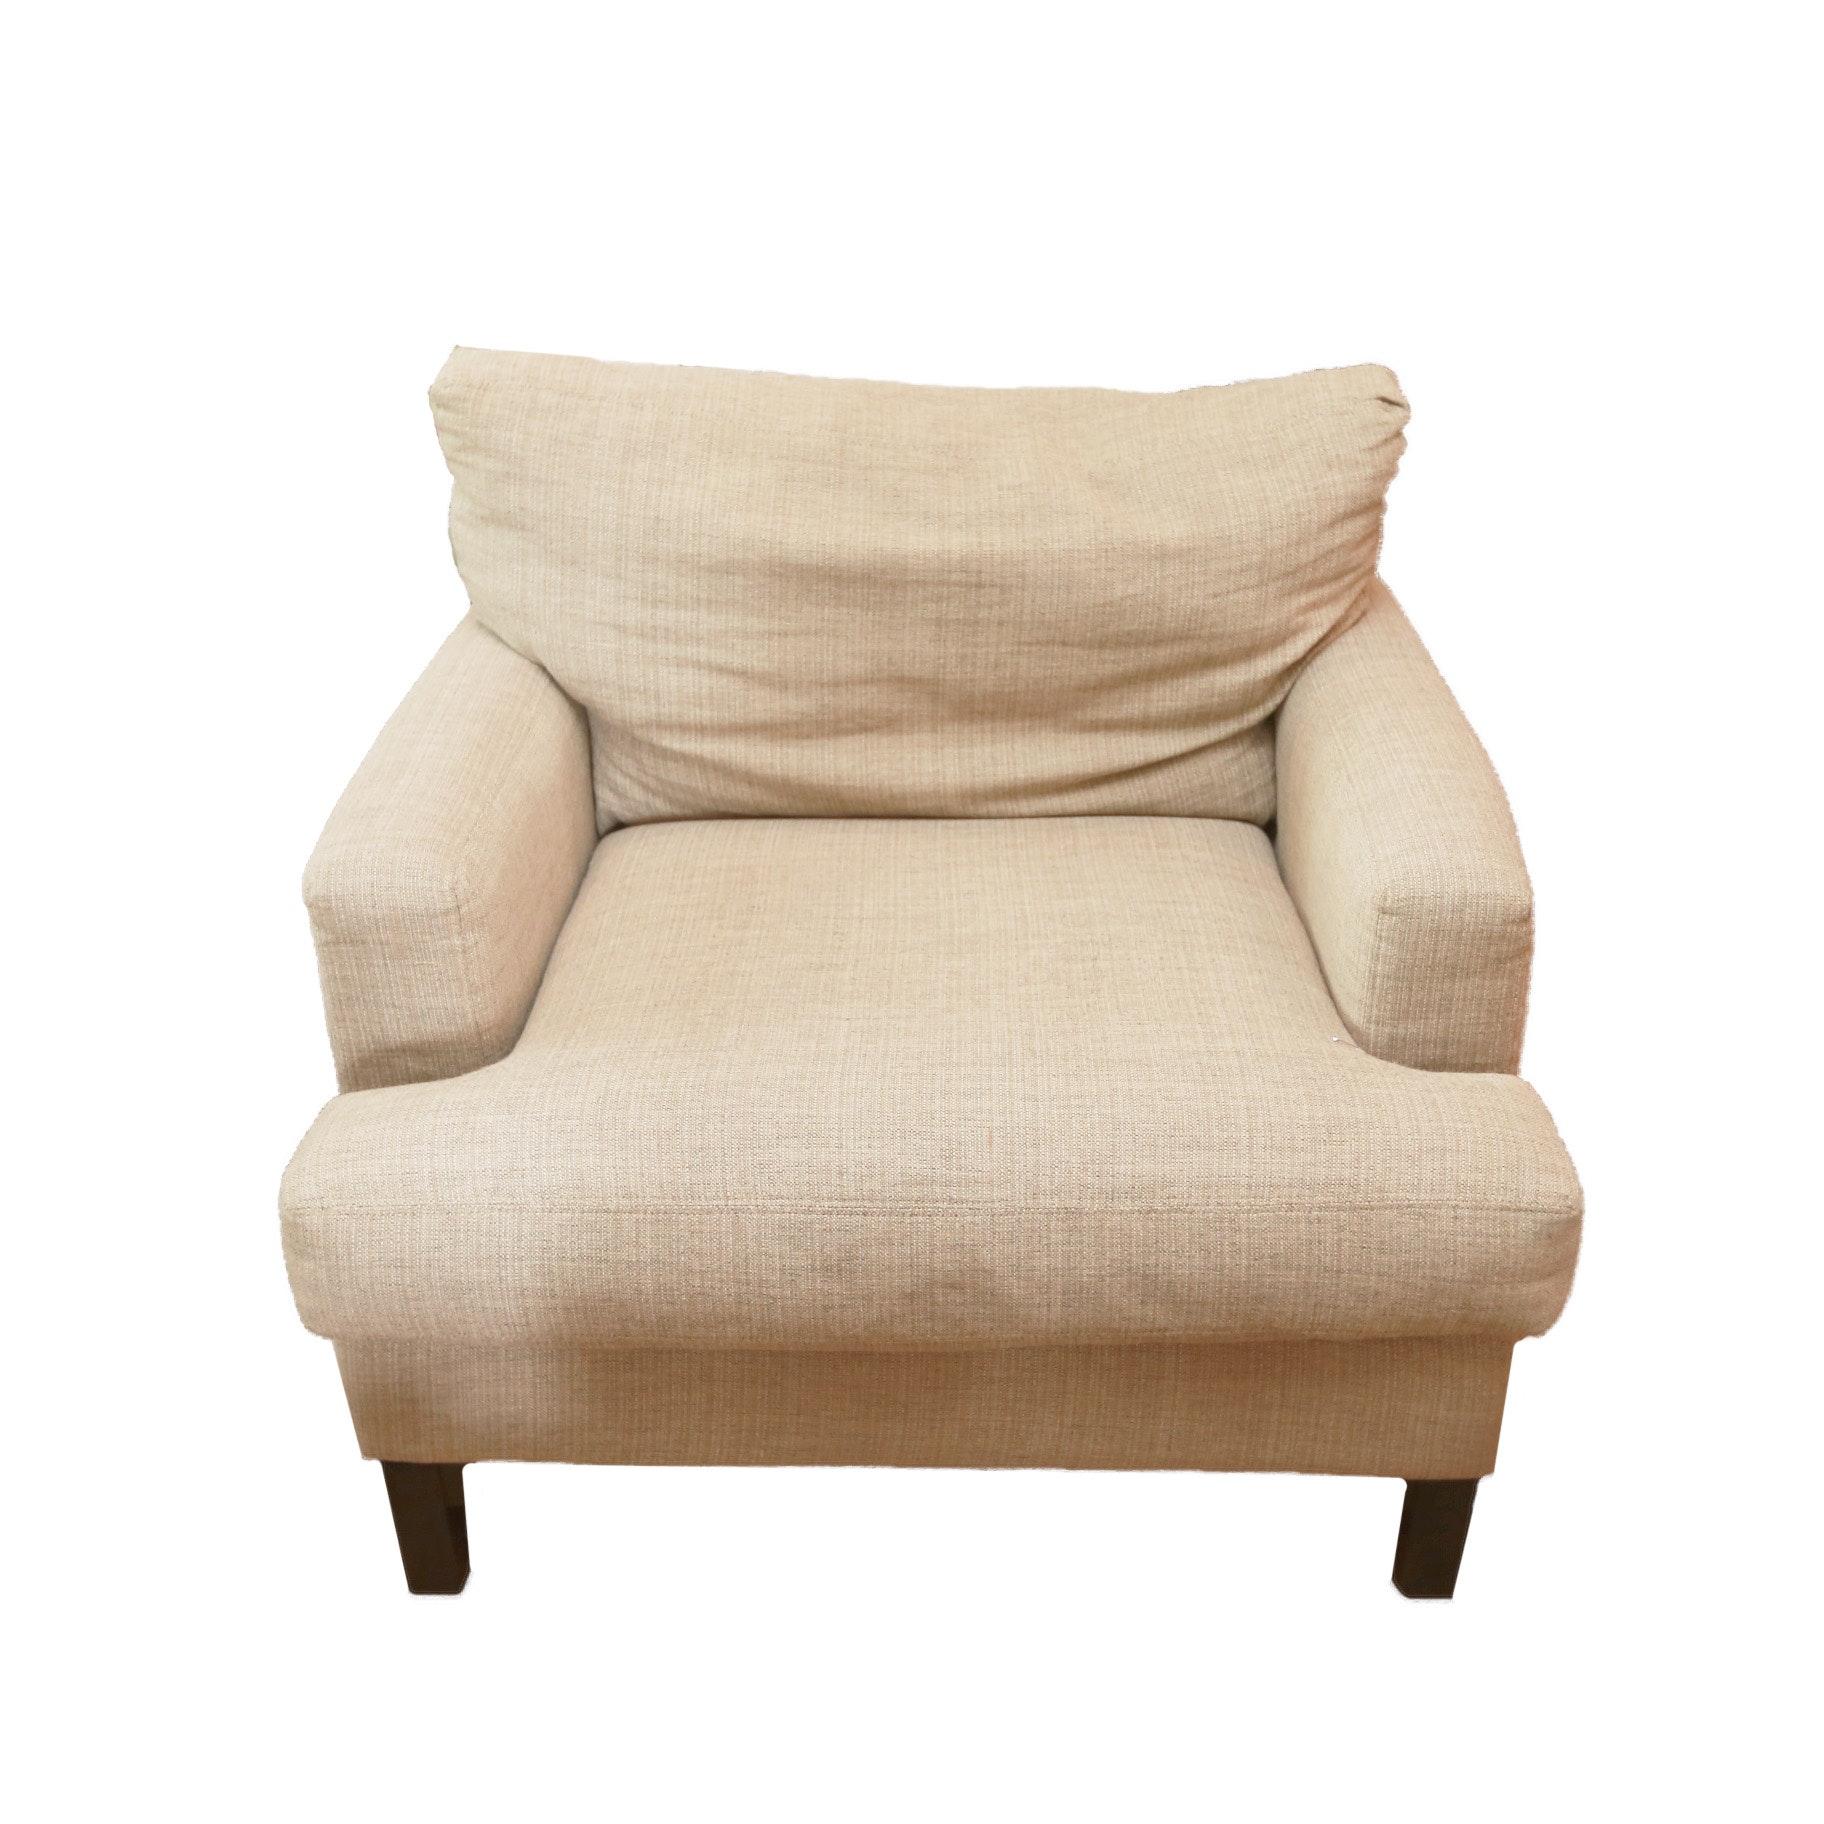 Beige Upholstered Armchair